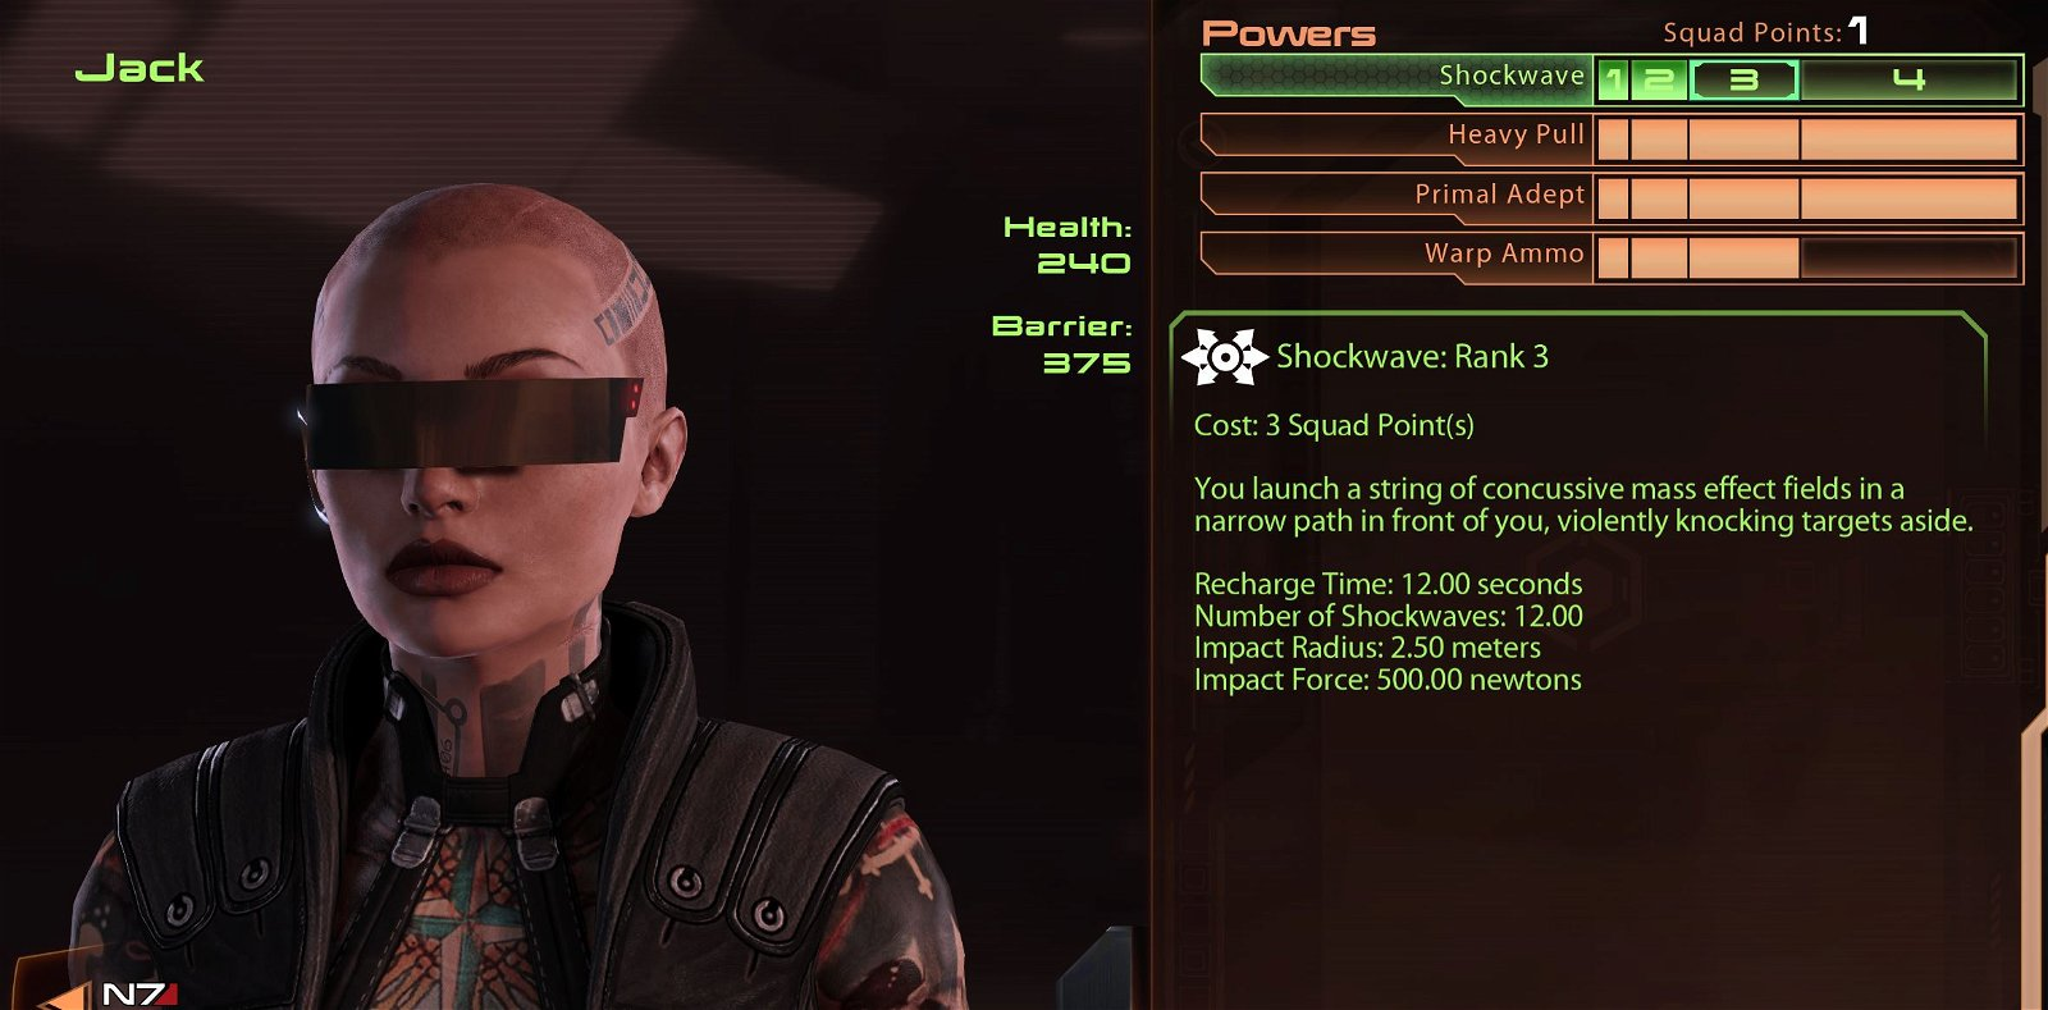 Jack build biotic explosion skills